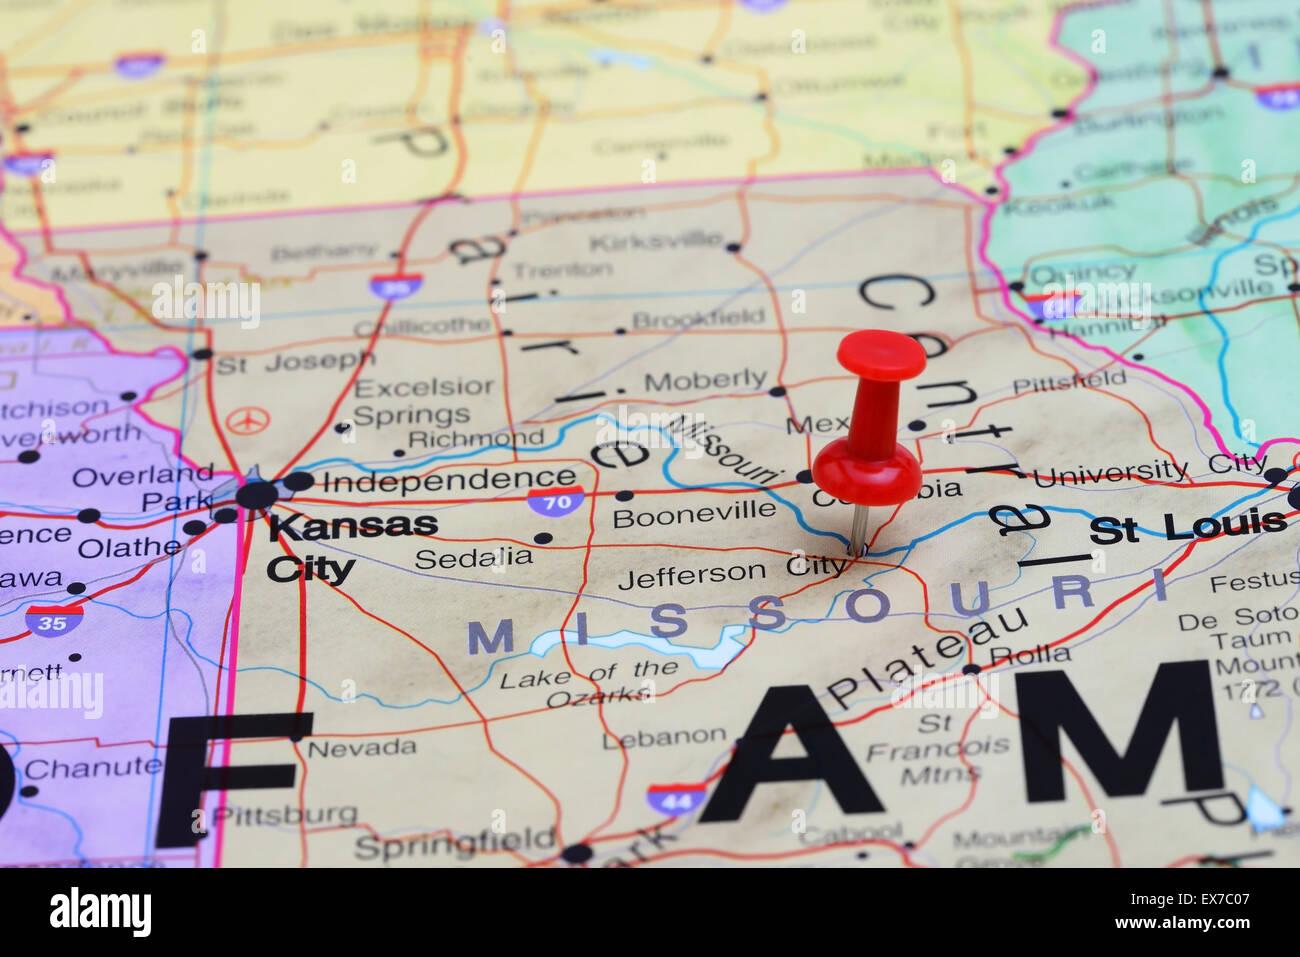 Jefferson City pinned on a map of USA Stock Photo 84985607 Alamy